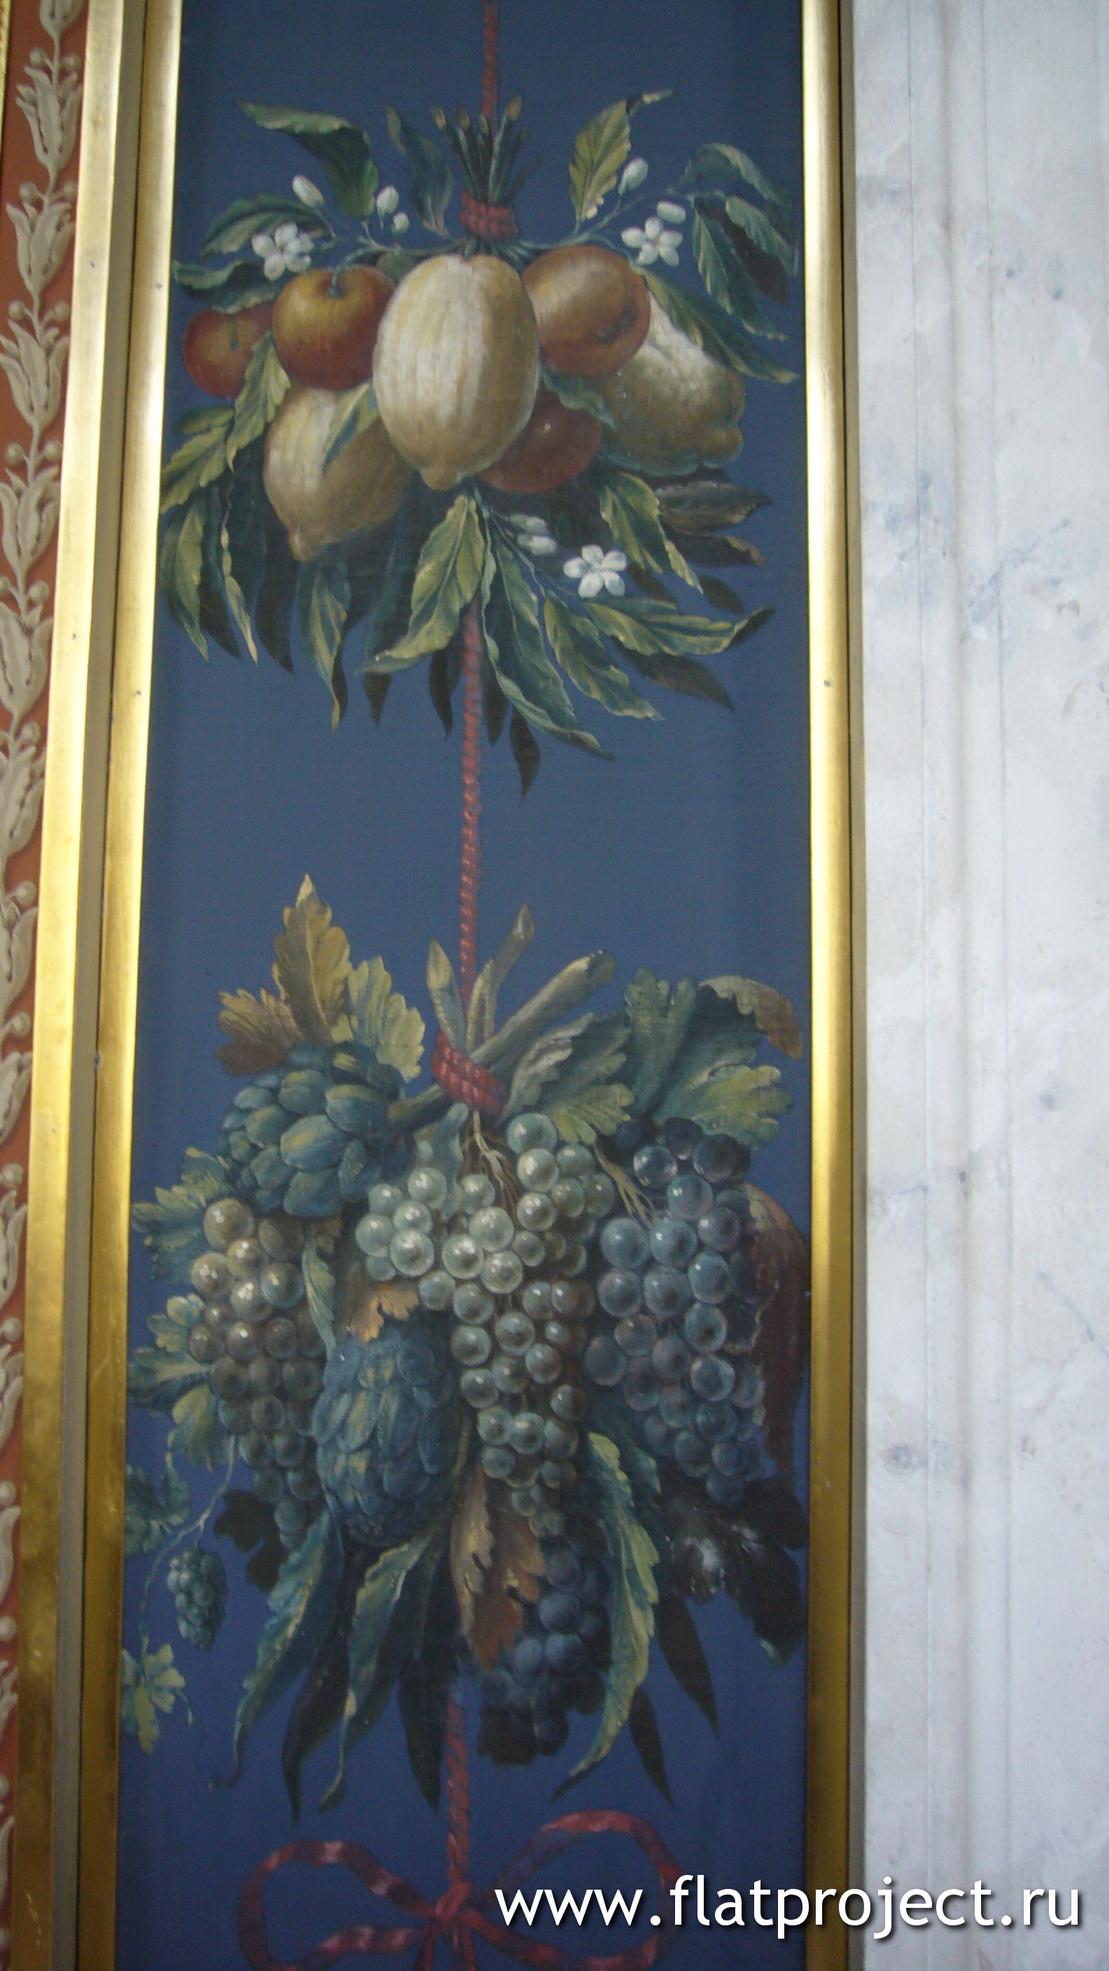 The State Hermitage museum interiors – photo 176